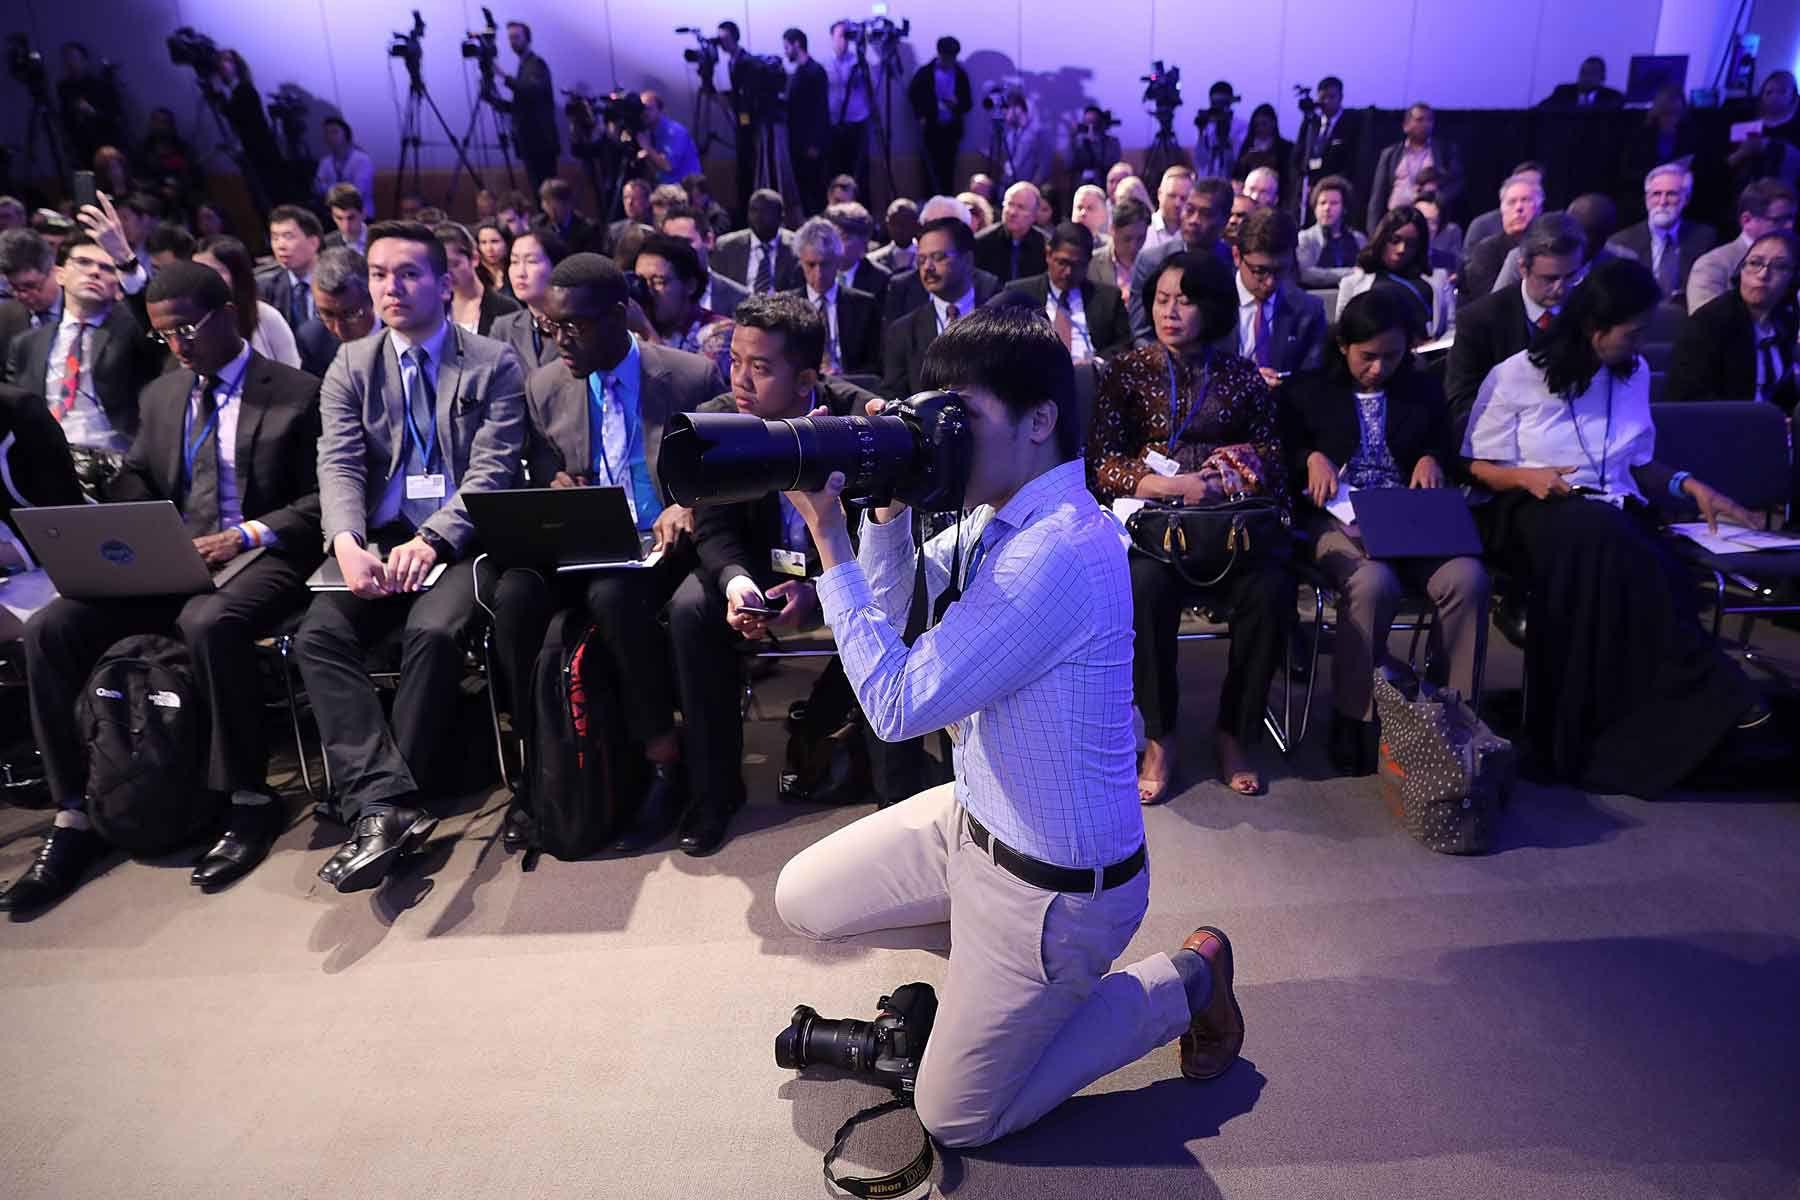 instagr news conference held - HD1800×1200